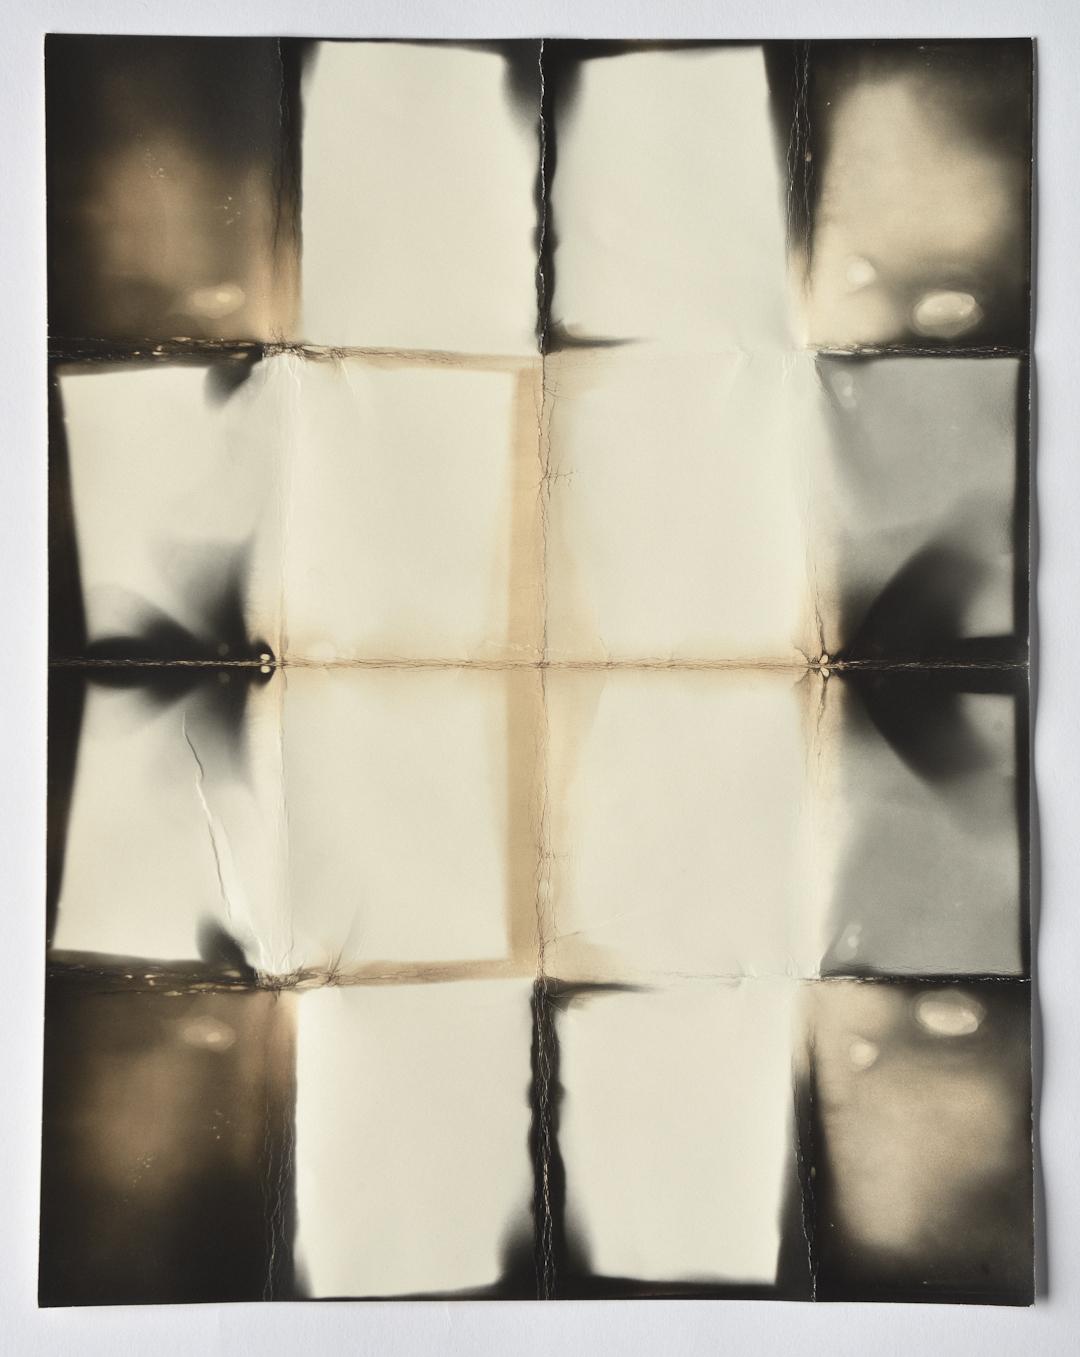 Fibre based silver gelatin paper (30x25cm)